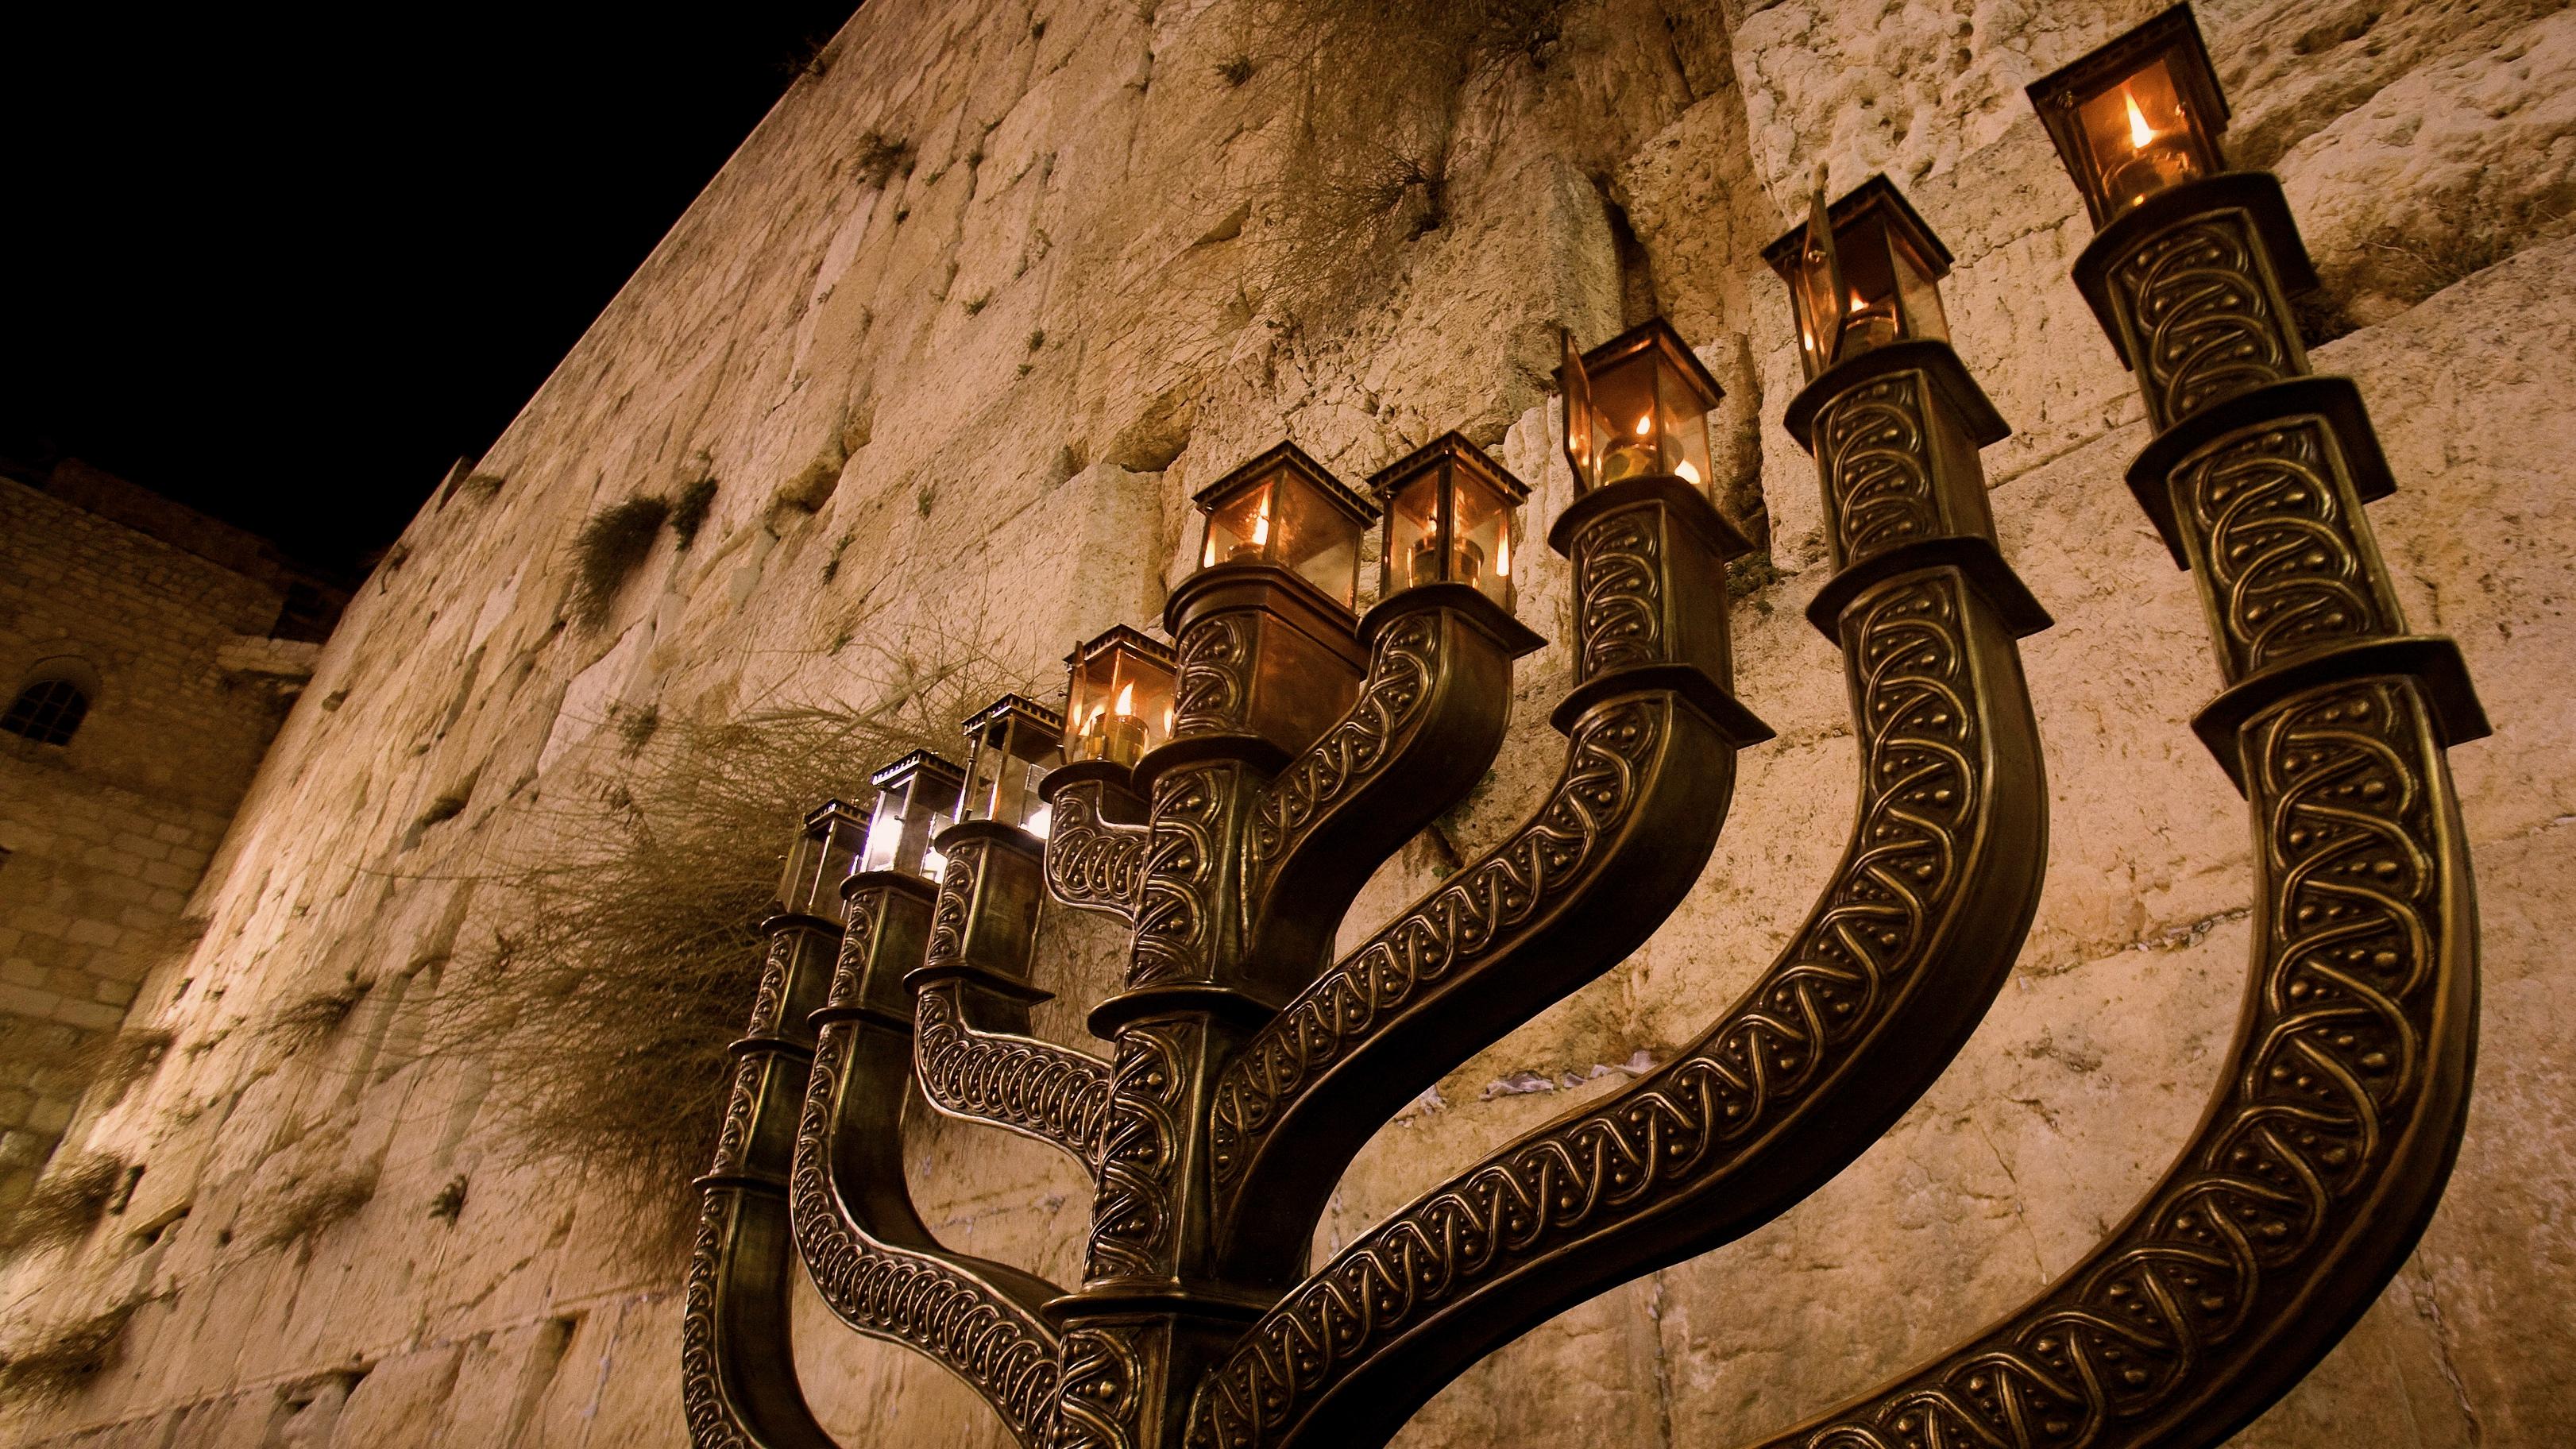 Hanukkah Menorah at the Western Wall in Jerusalem's Old City